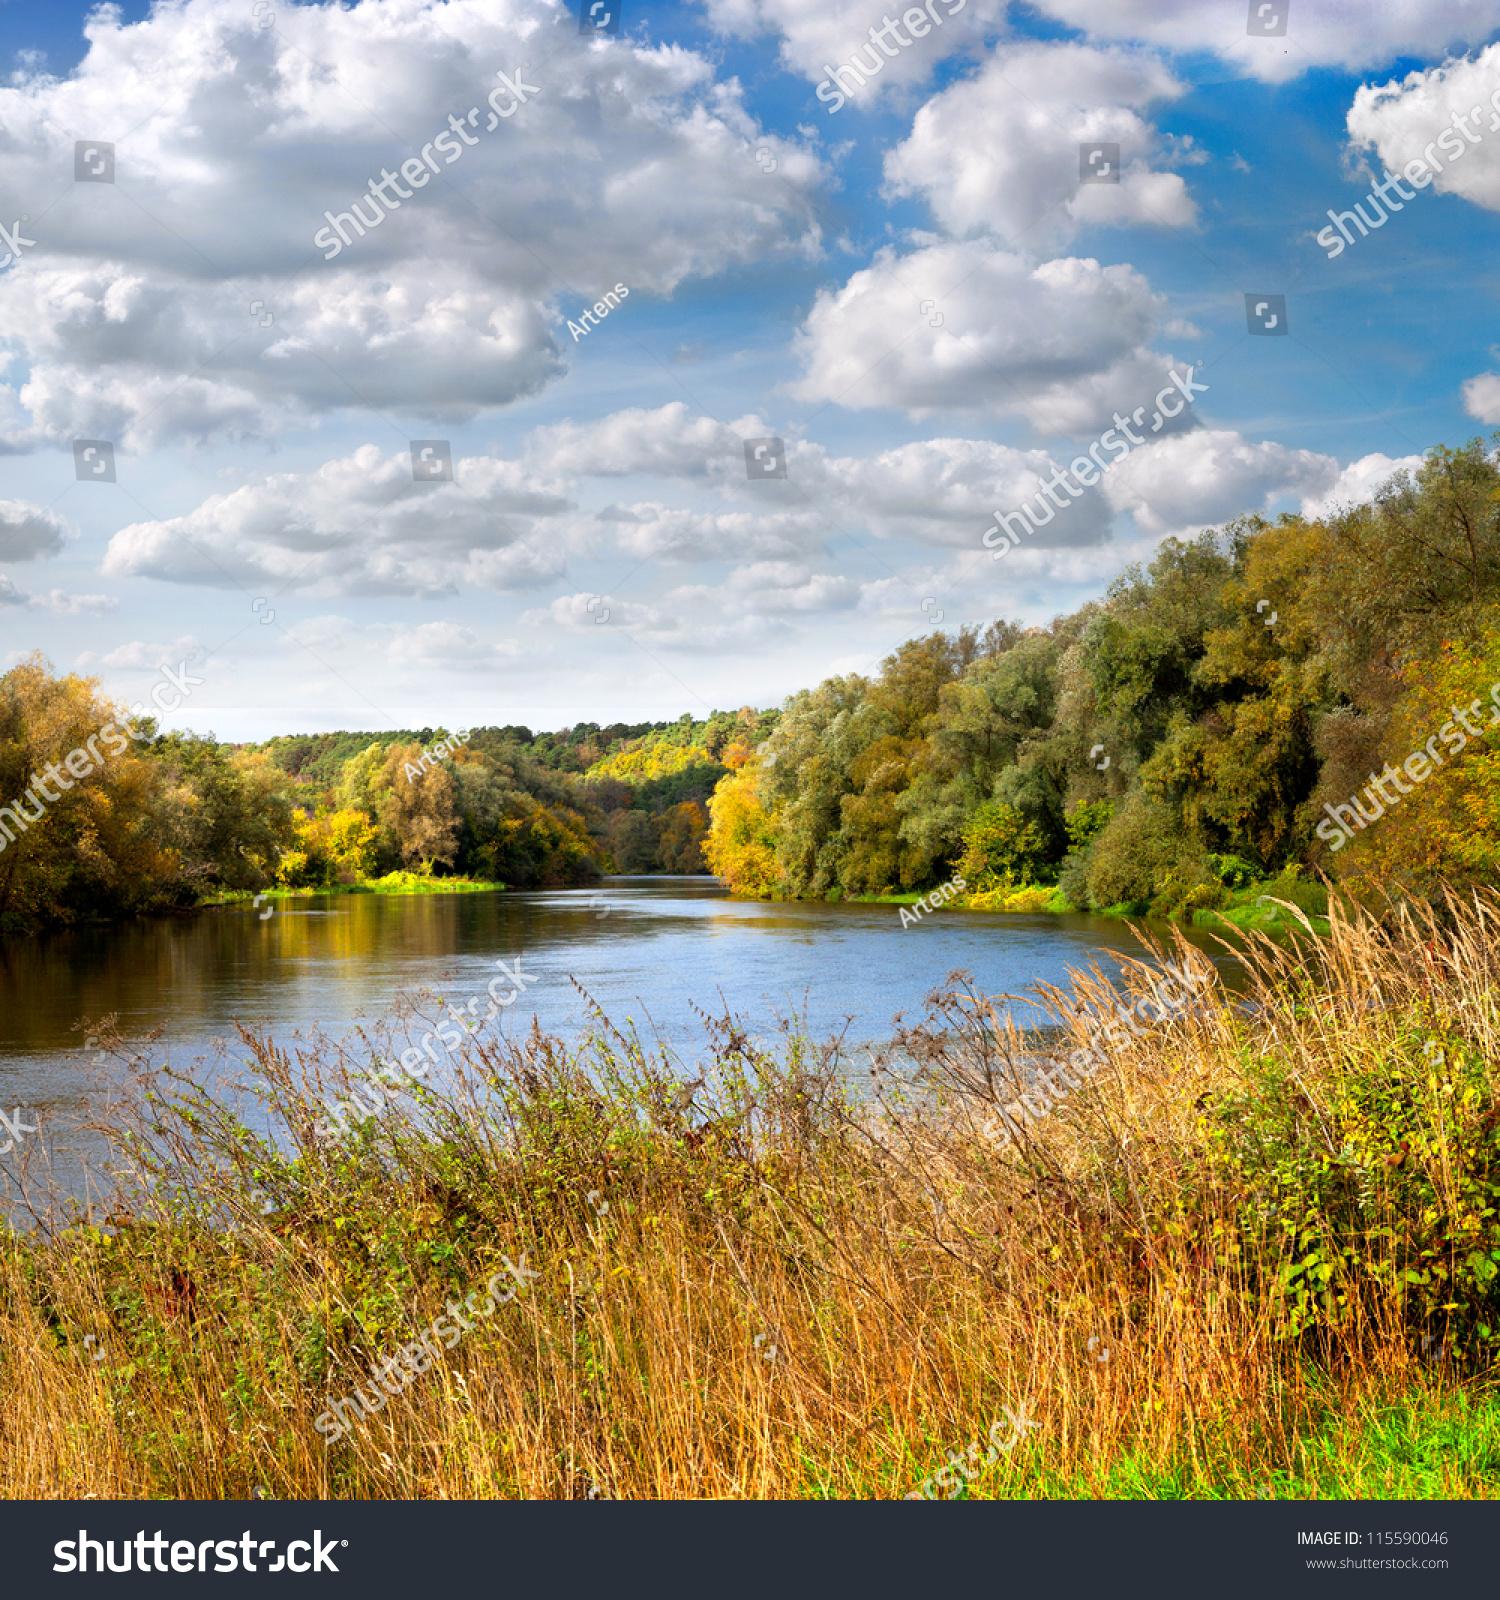 2560x1600 river grass cloudy - photo #15